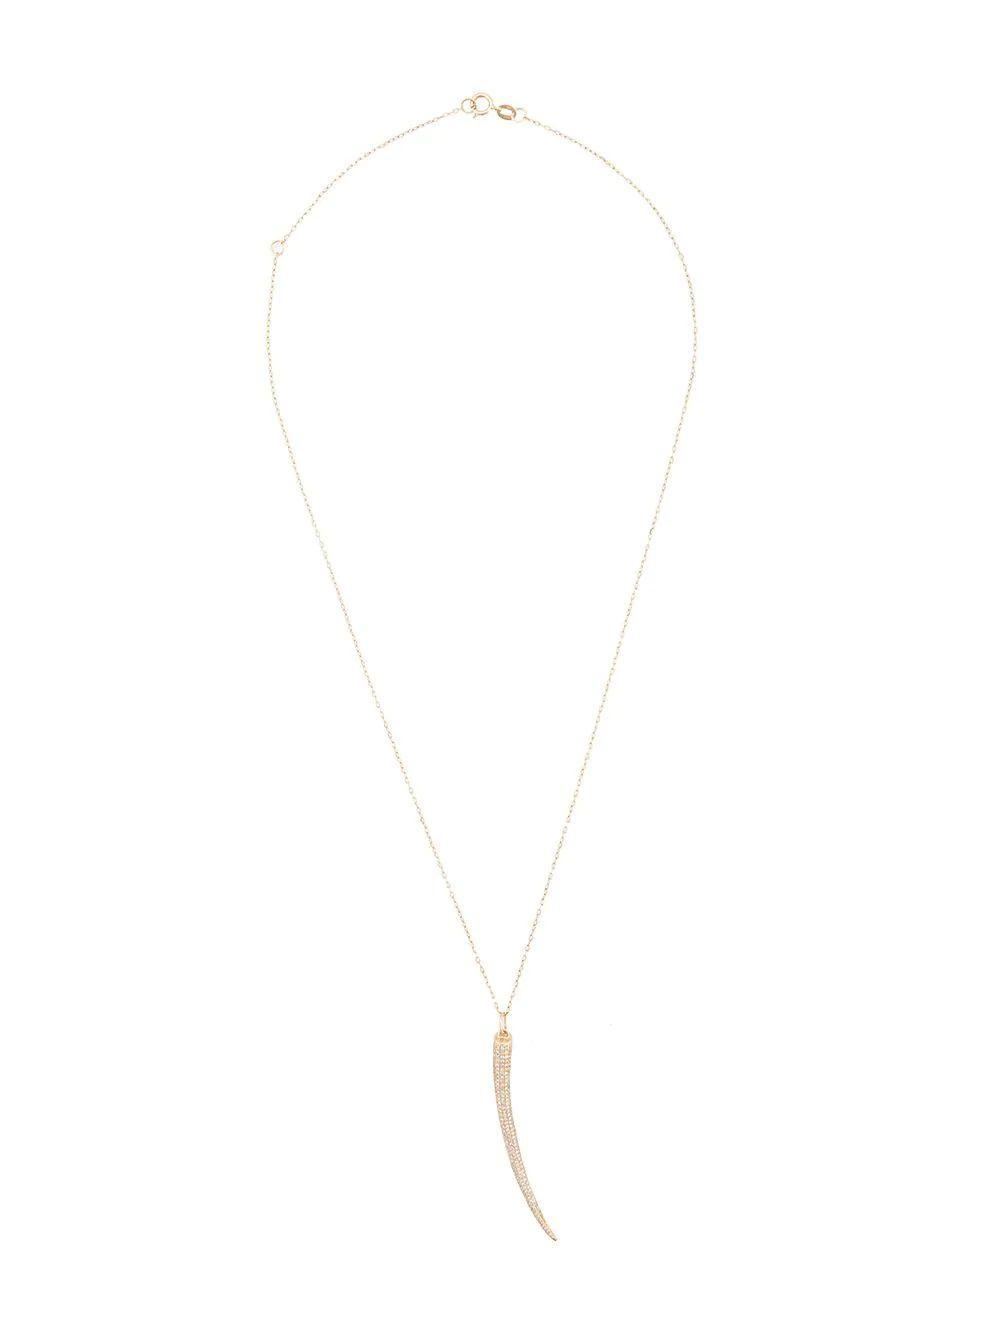 Pave Horn Necklace Item # N226